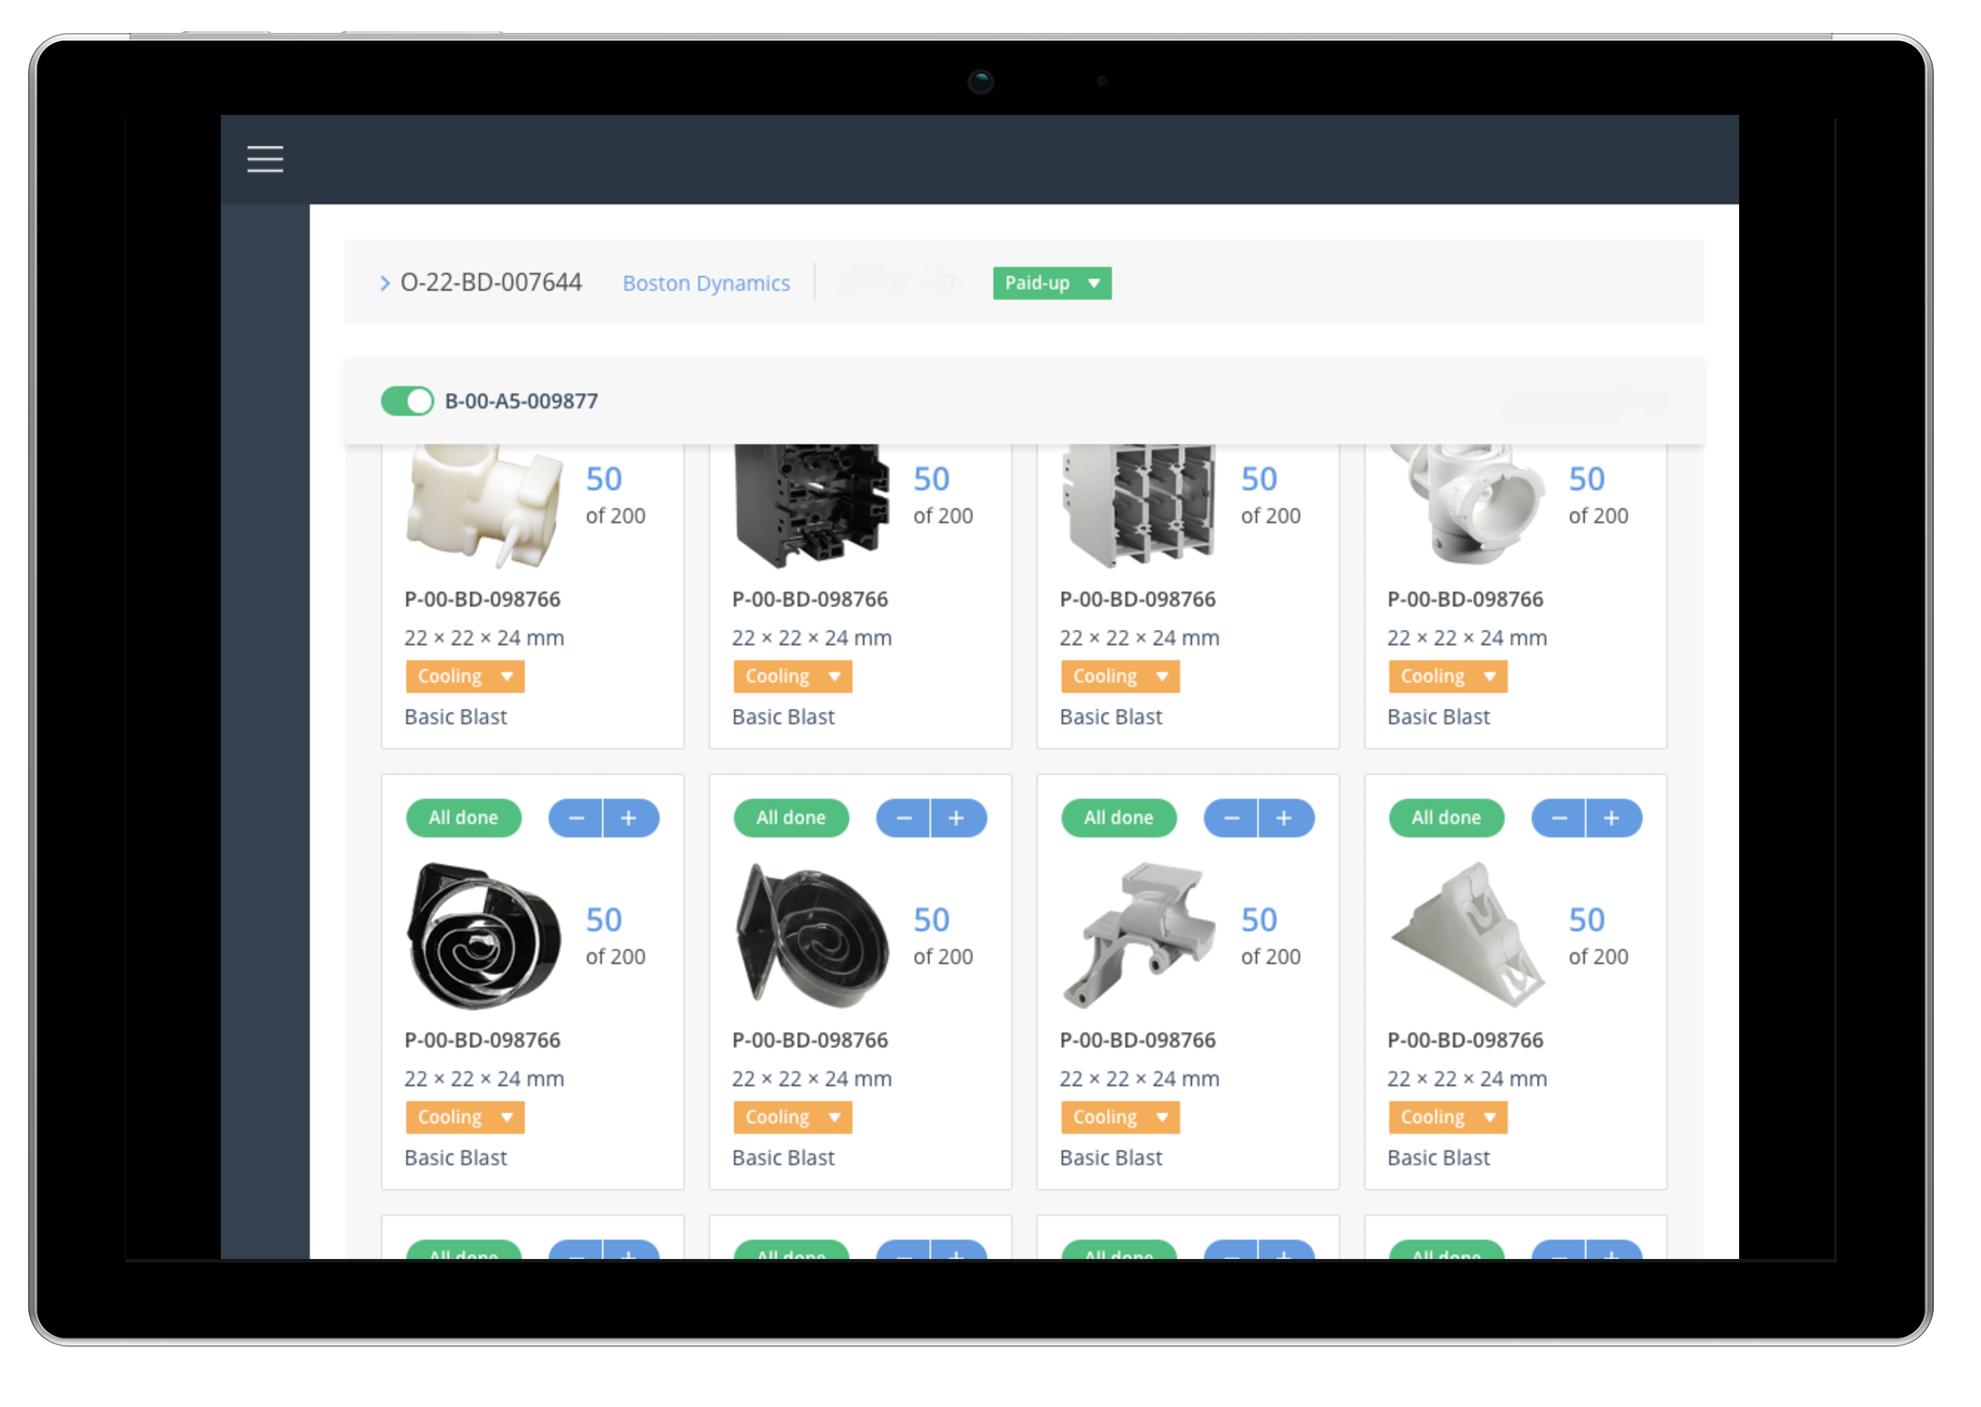 AMFG Announces Multi-Platform Solution